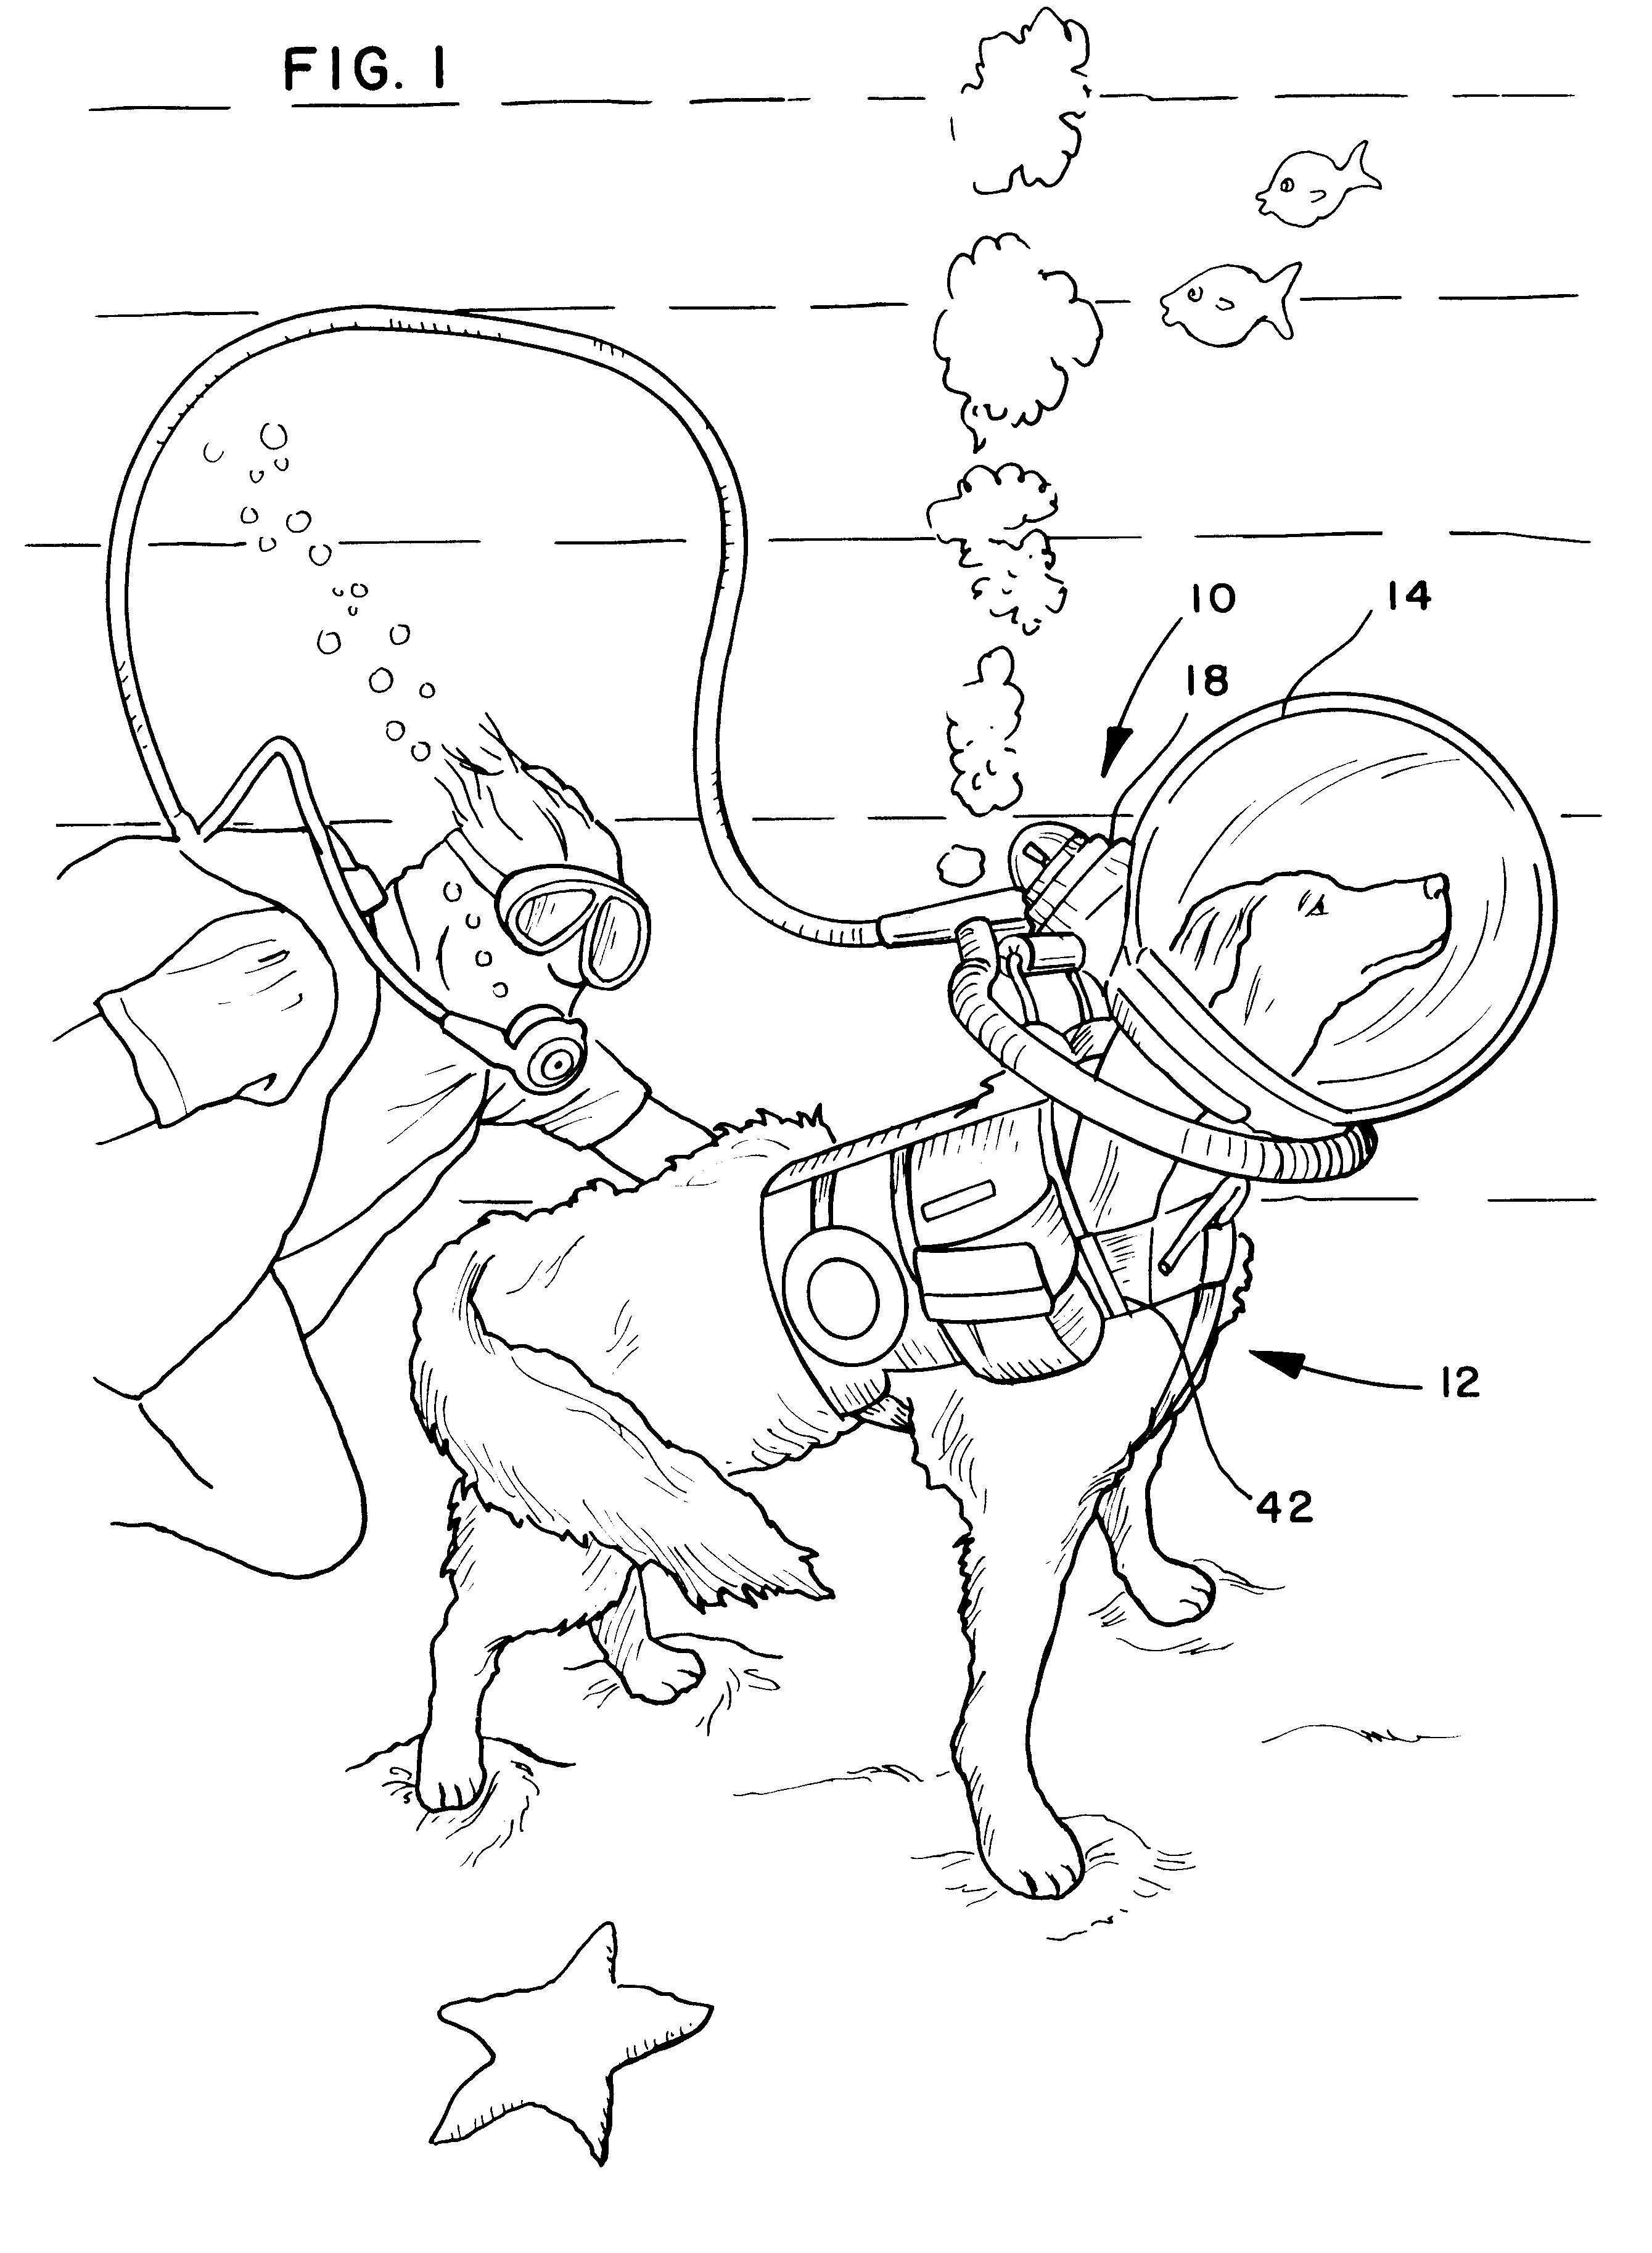 patent us6206000 - canine scuba diving apparatus